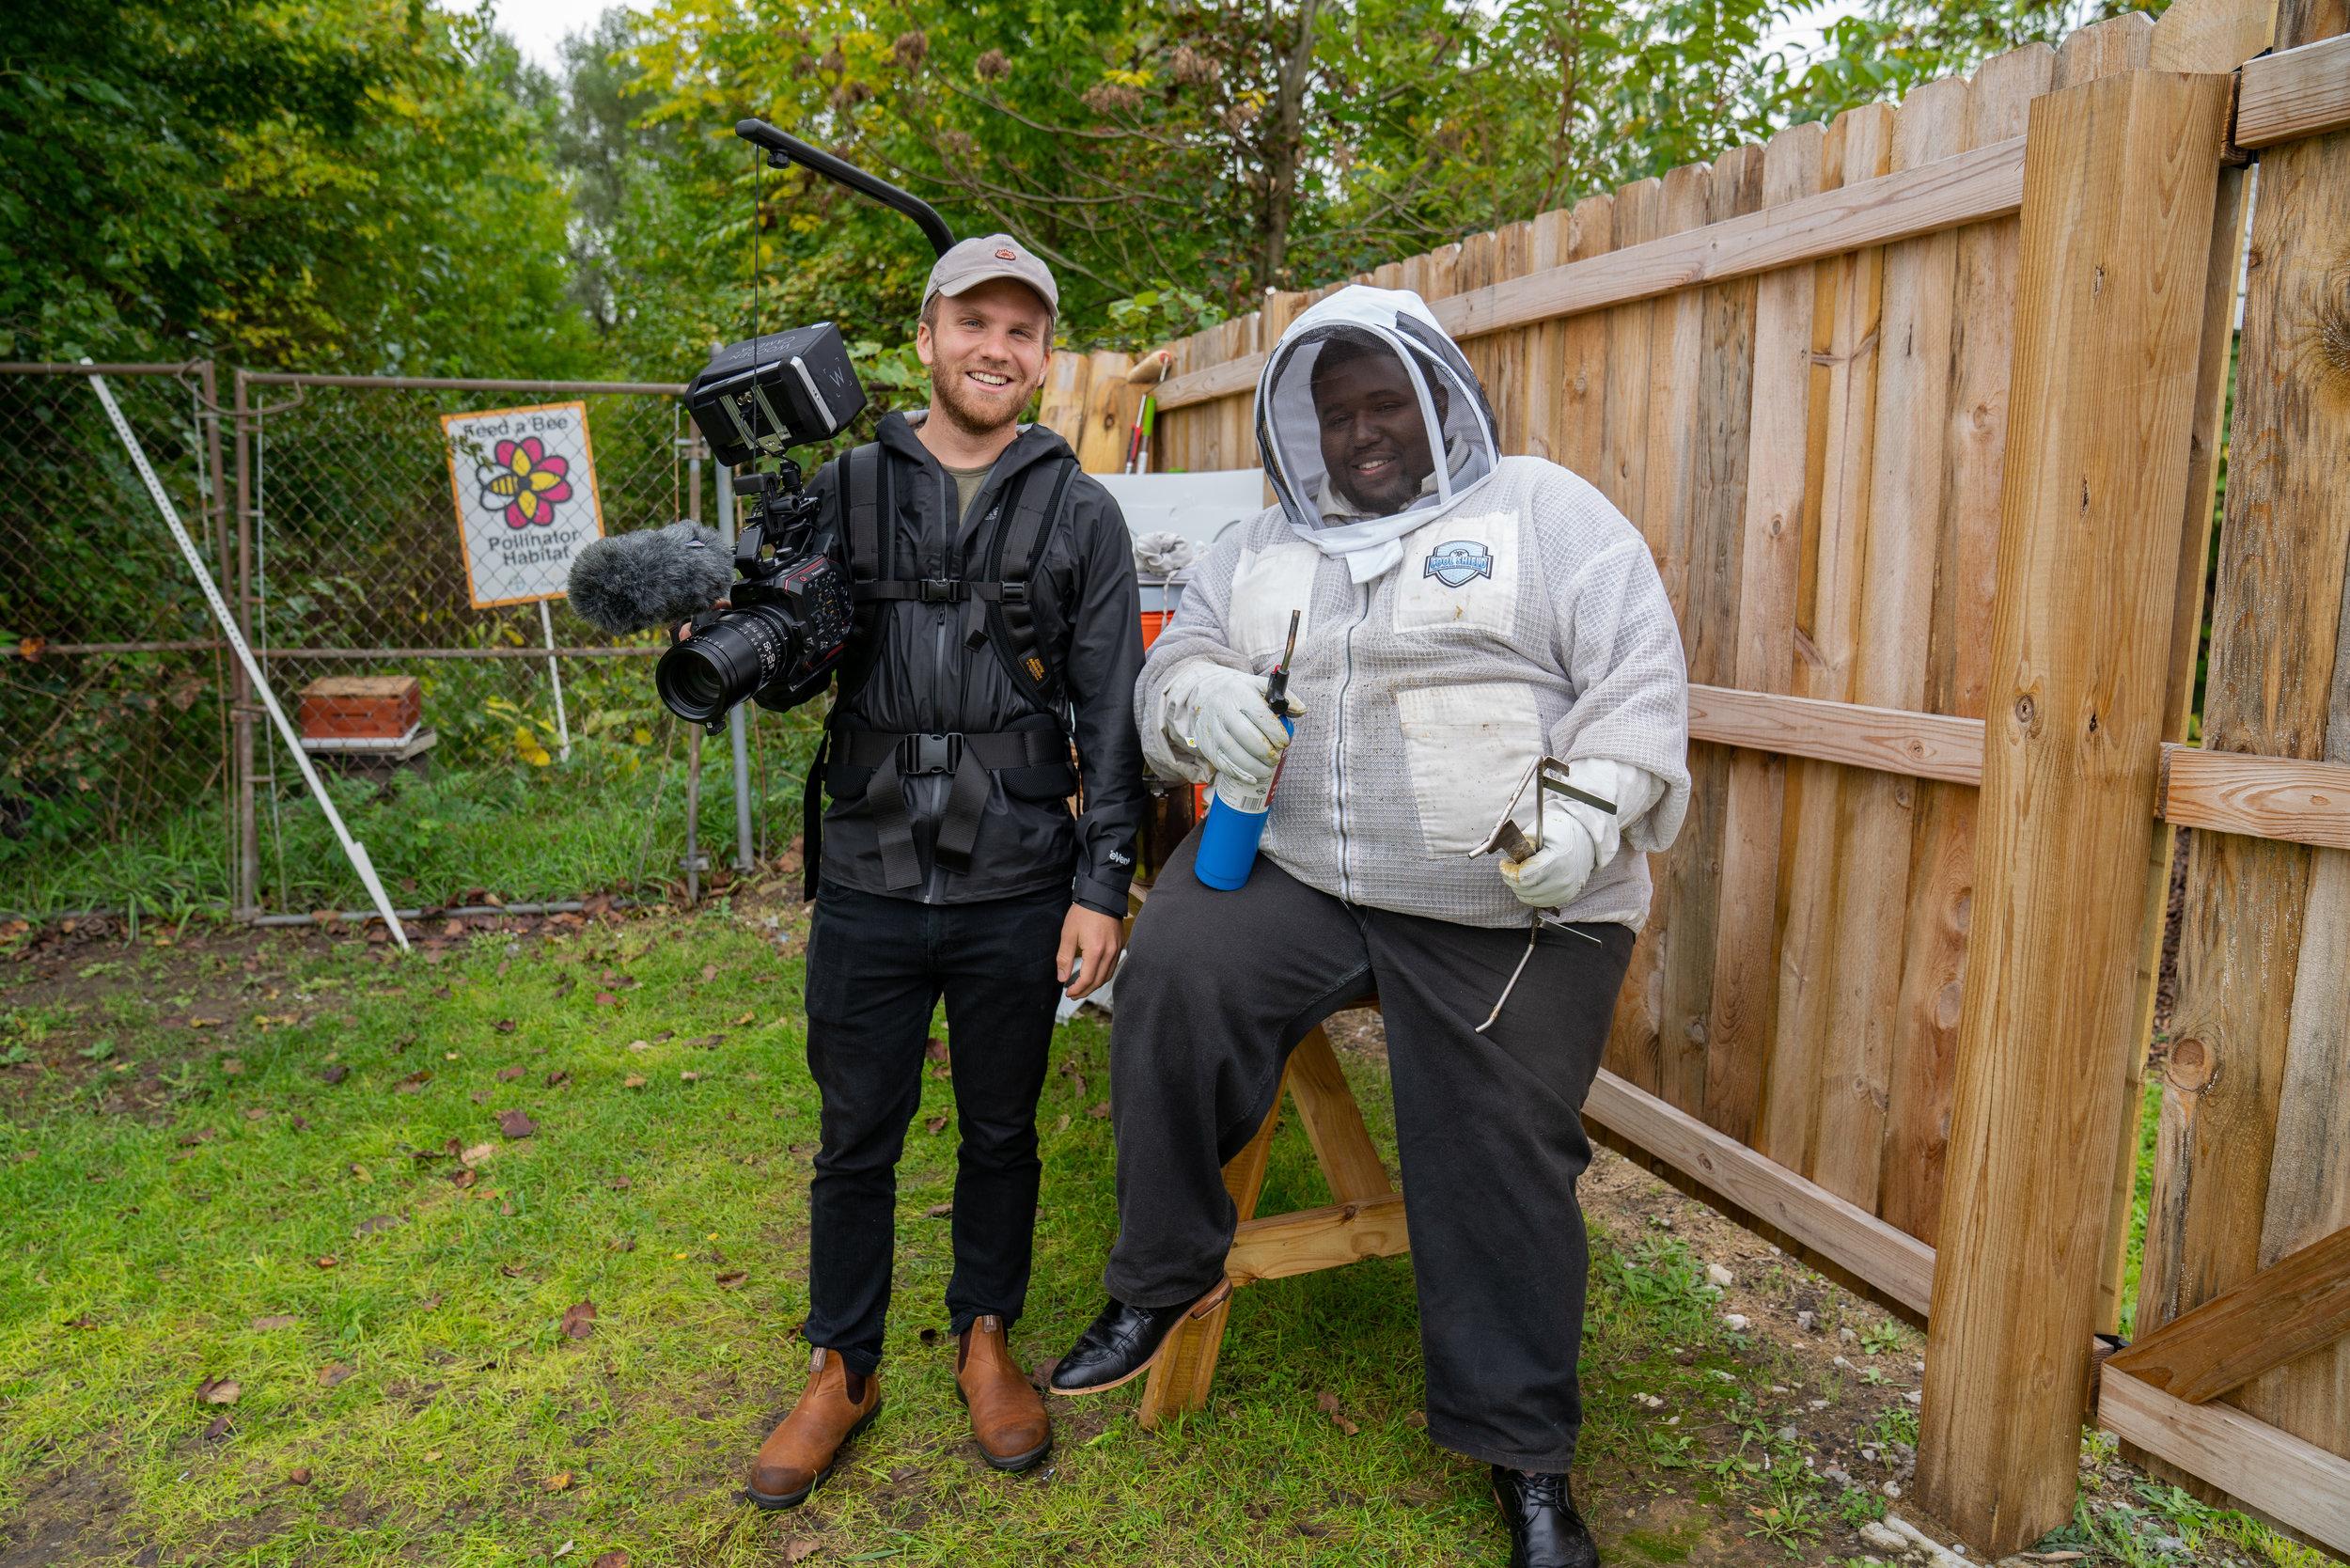 Tim Paule & Nicole Lindsey / Co-Owners - Detroit Hives